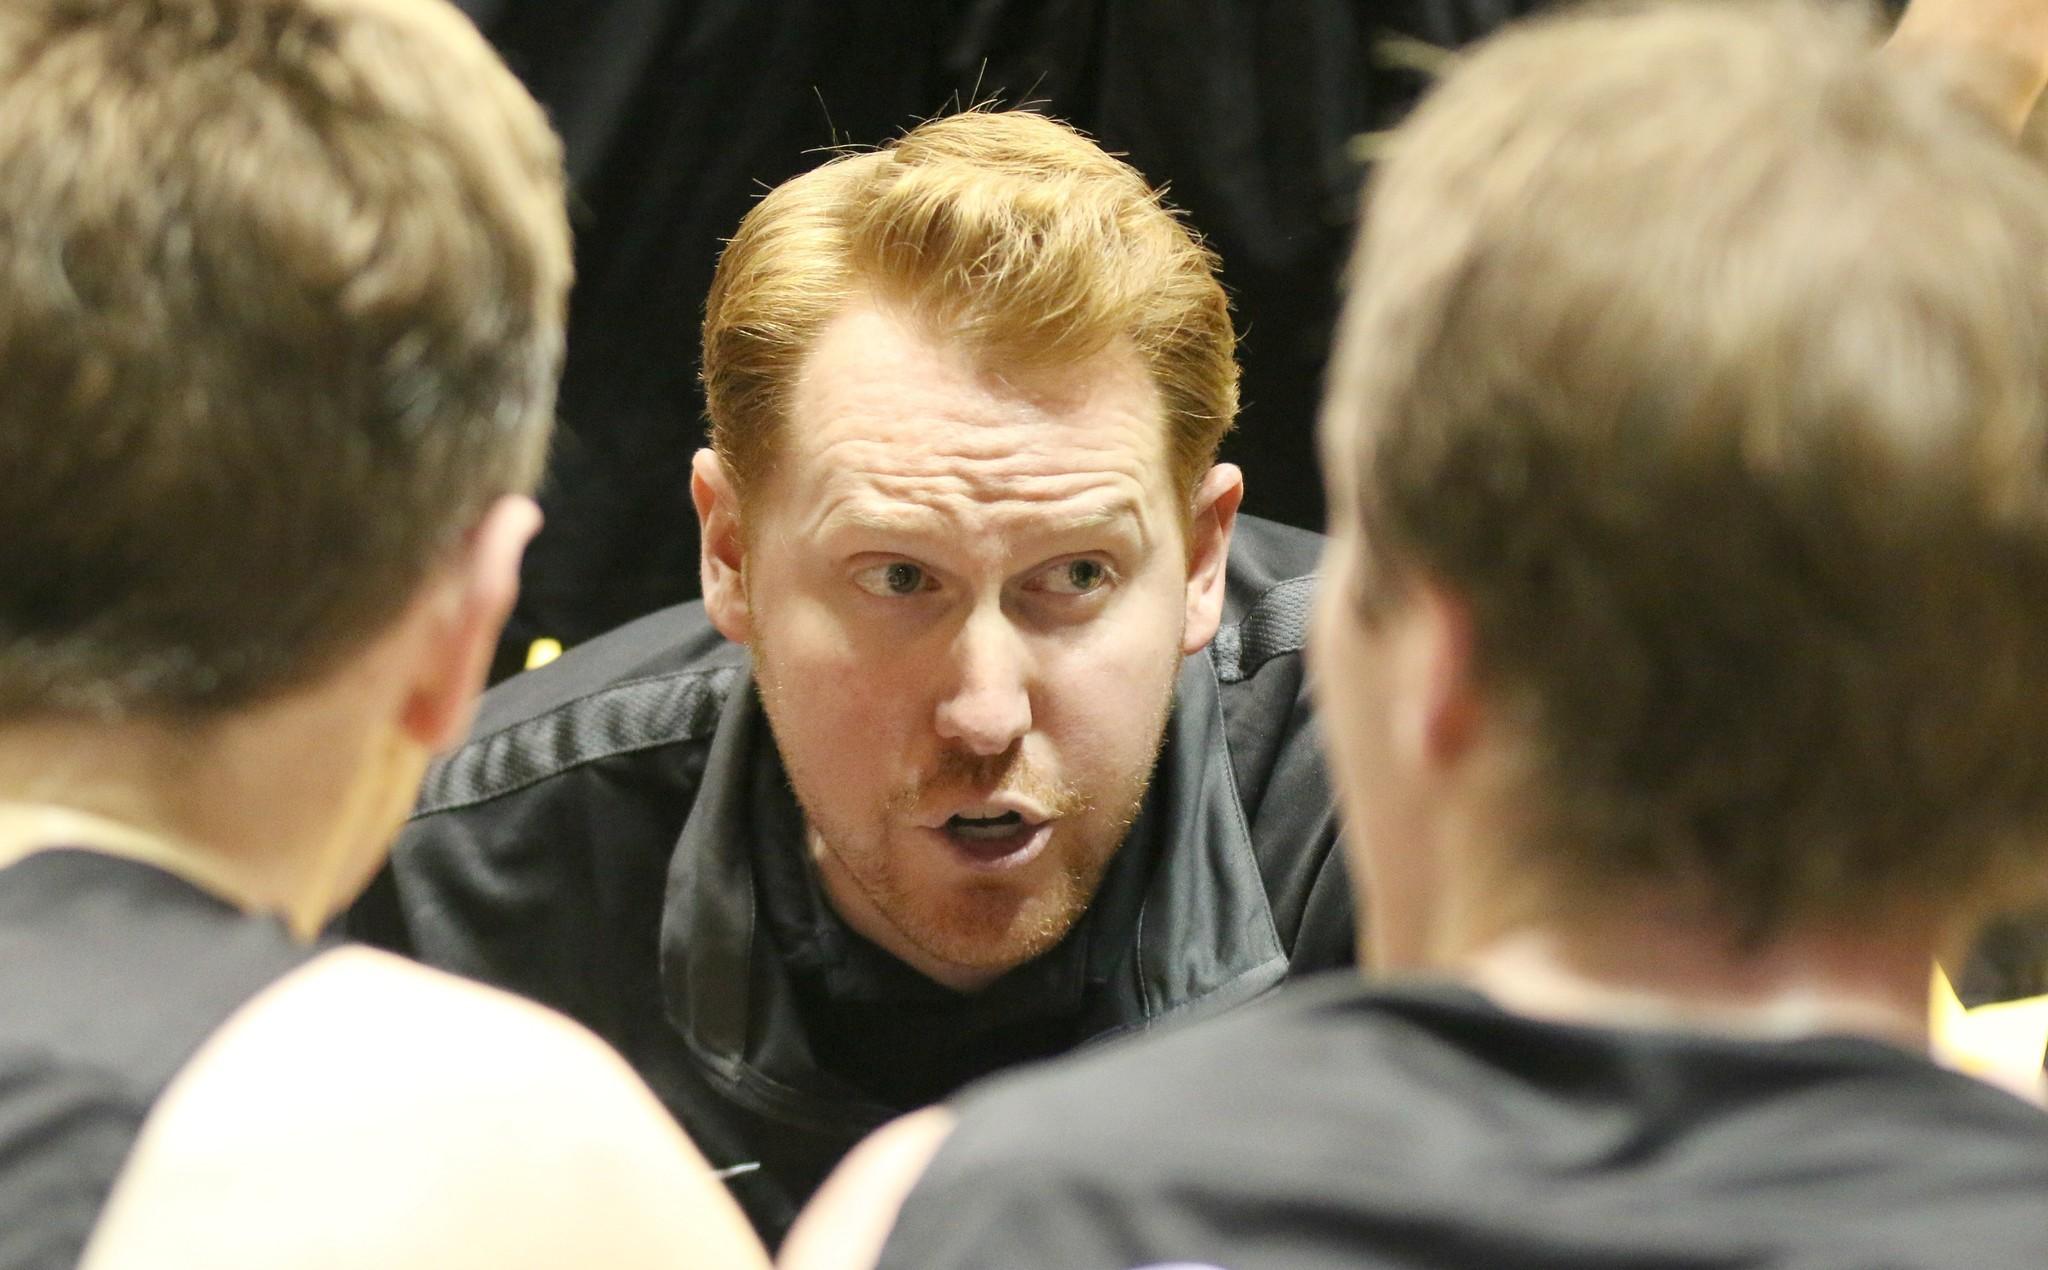 Head Coach Sam Eshelman was calling the shots for the Carlsbad boys.